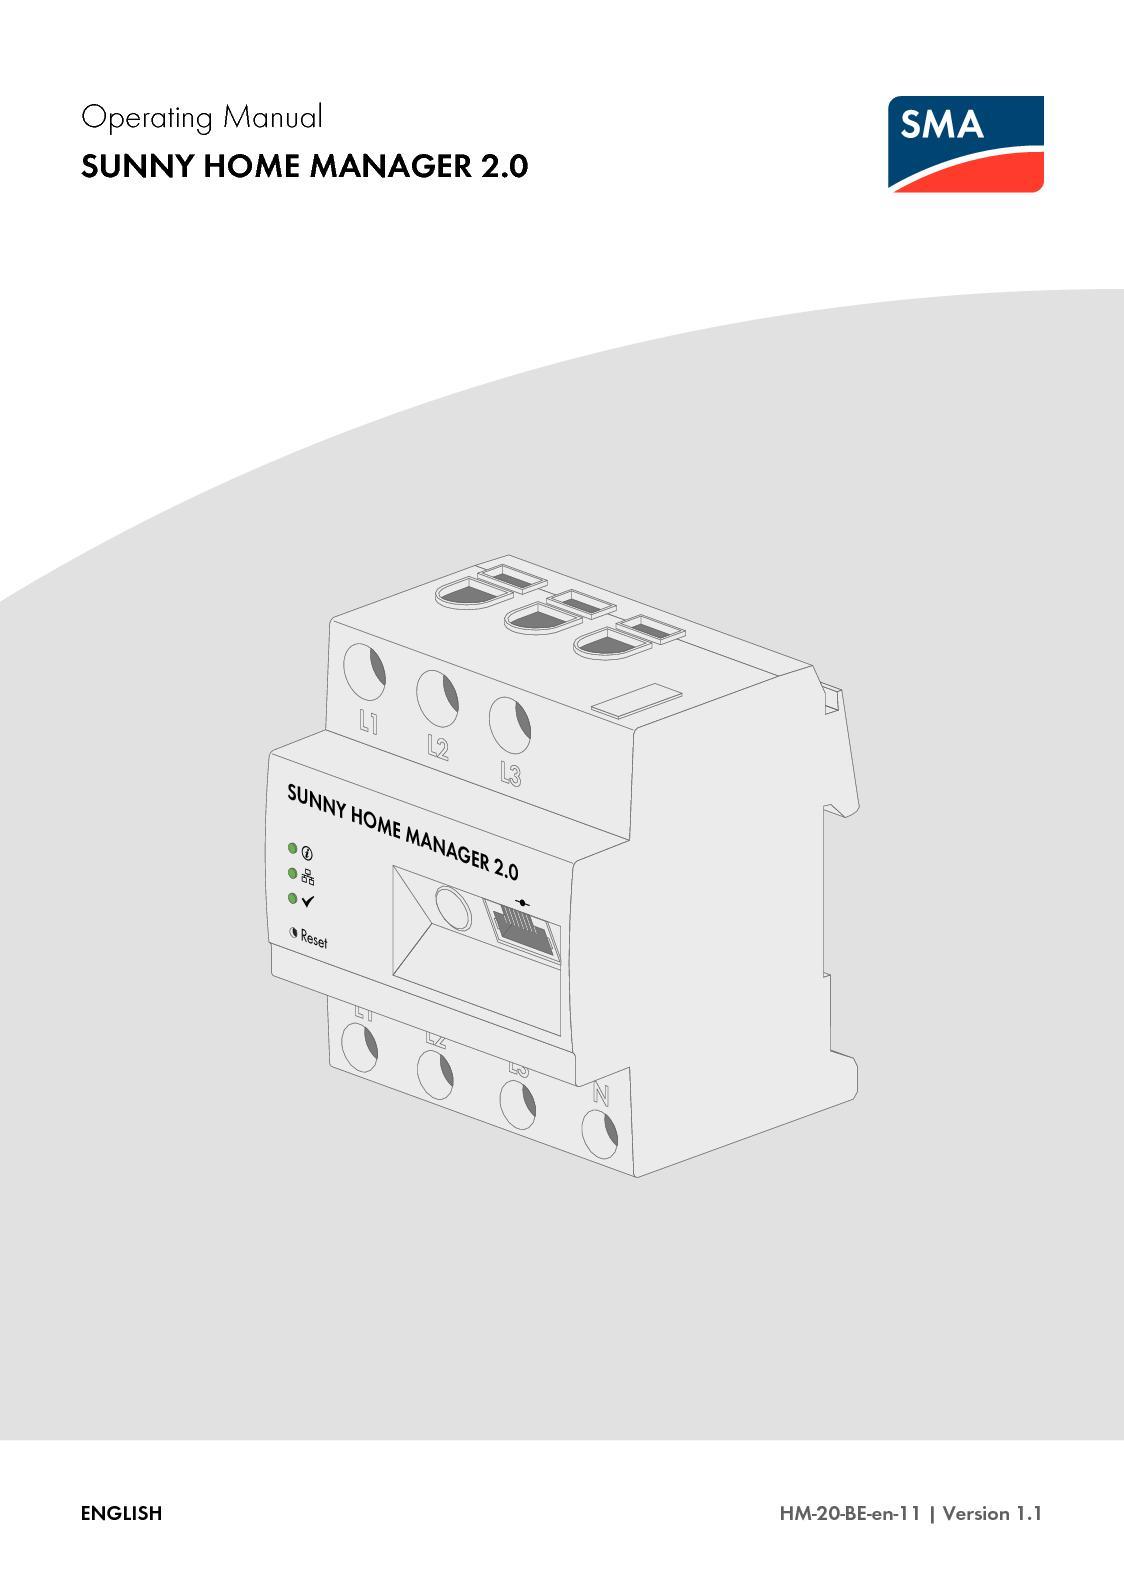 54 Kb Jpeg Electric Fuel Pump Failure Causes Low Fuel Jpg Http Www